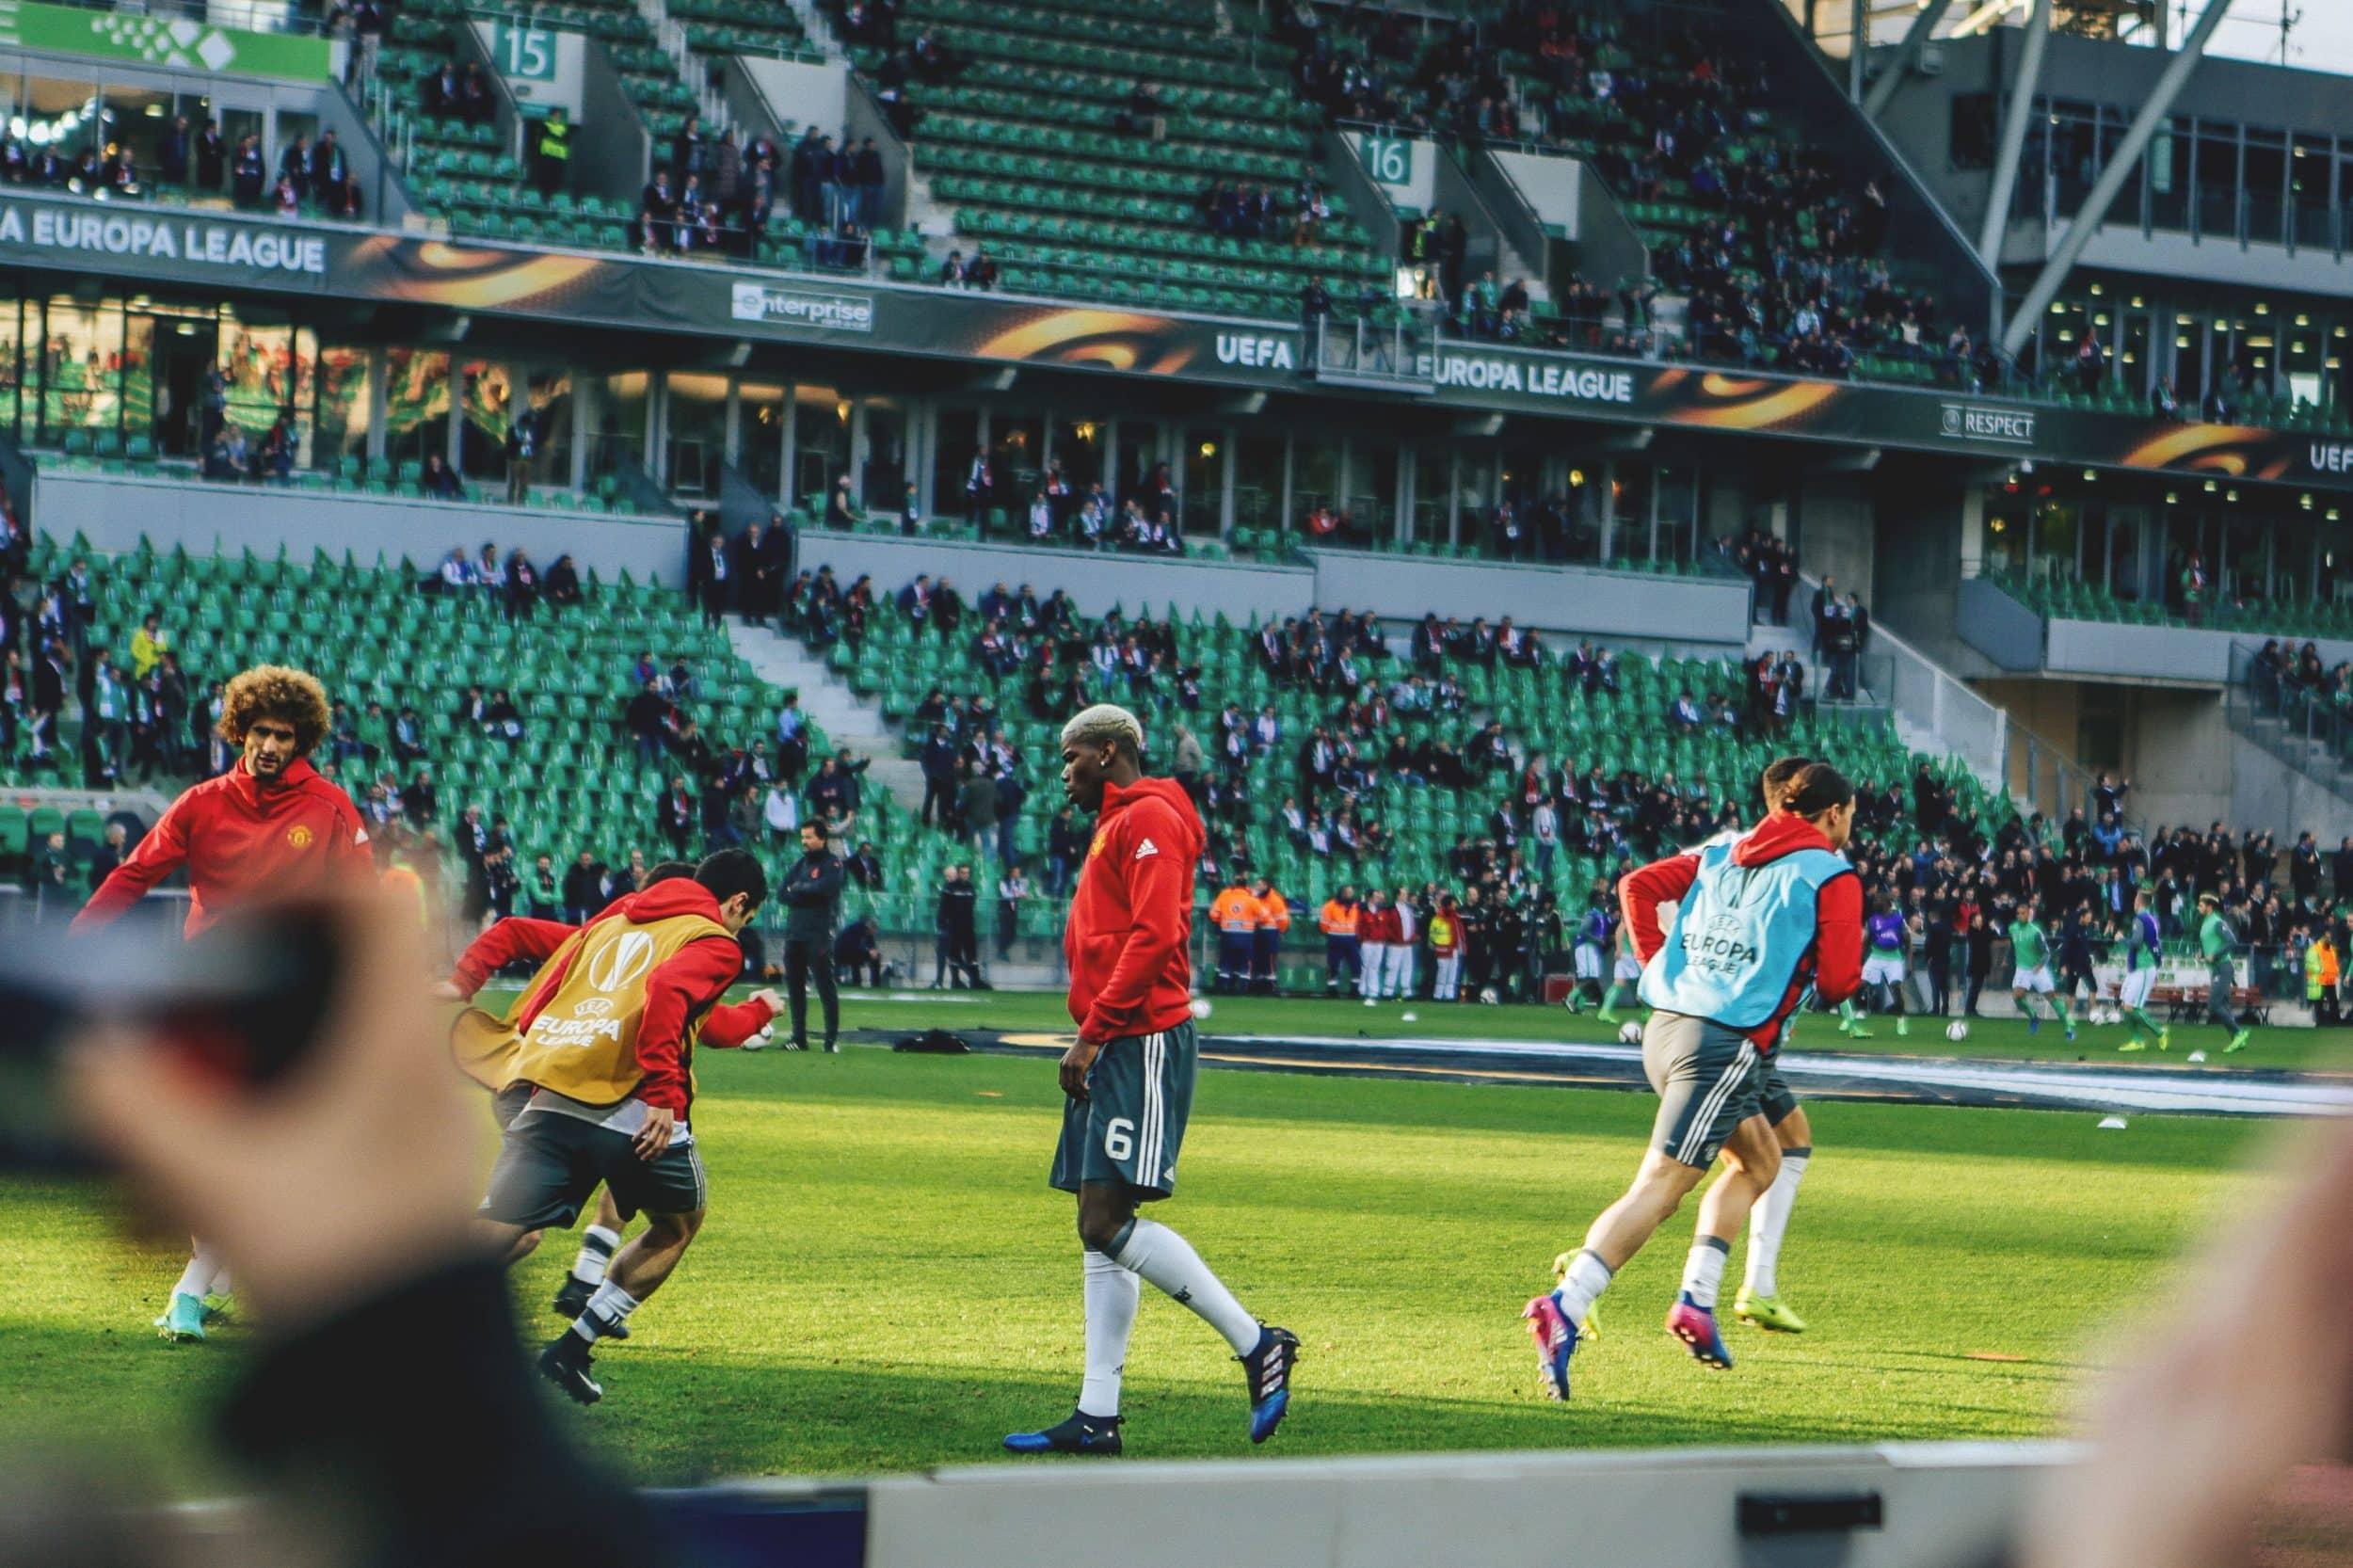 au-stade-geoffroy-guichard-asse-manchester-united-europa-league-16-min